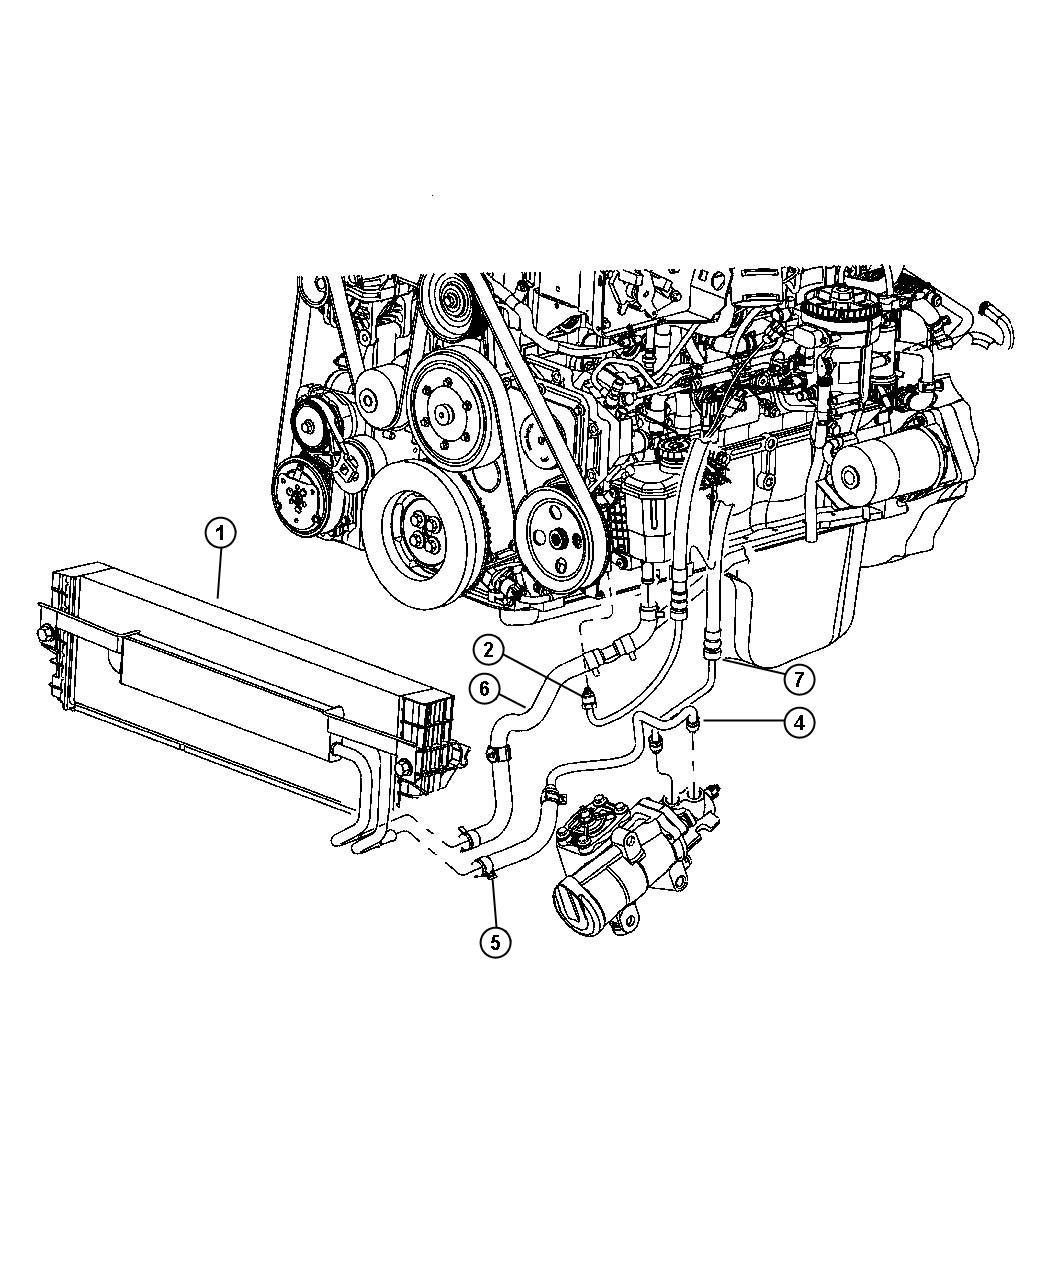 Ford F150 Transmission Service Repair Manuals